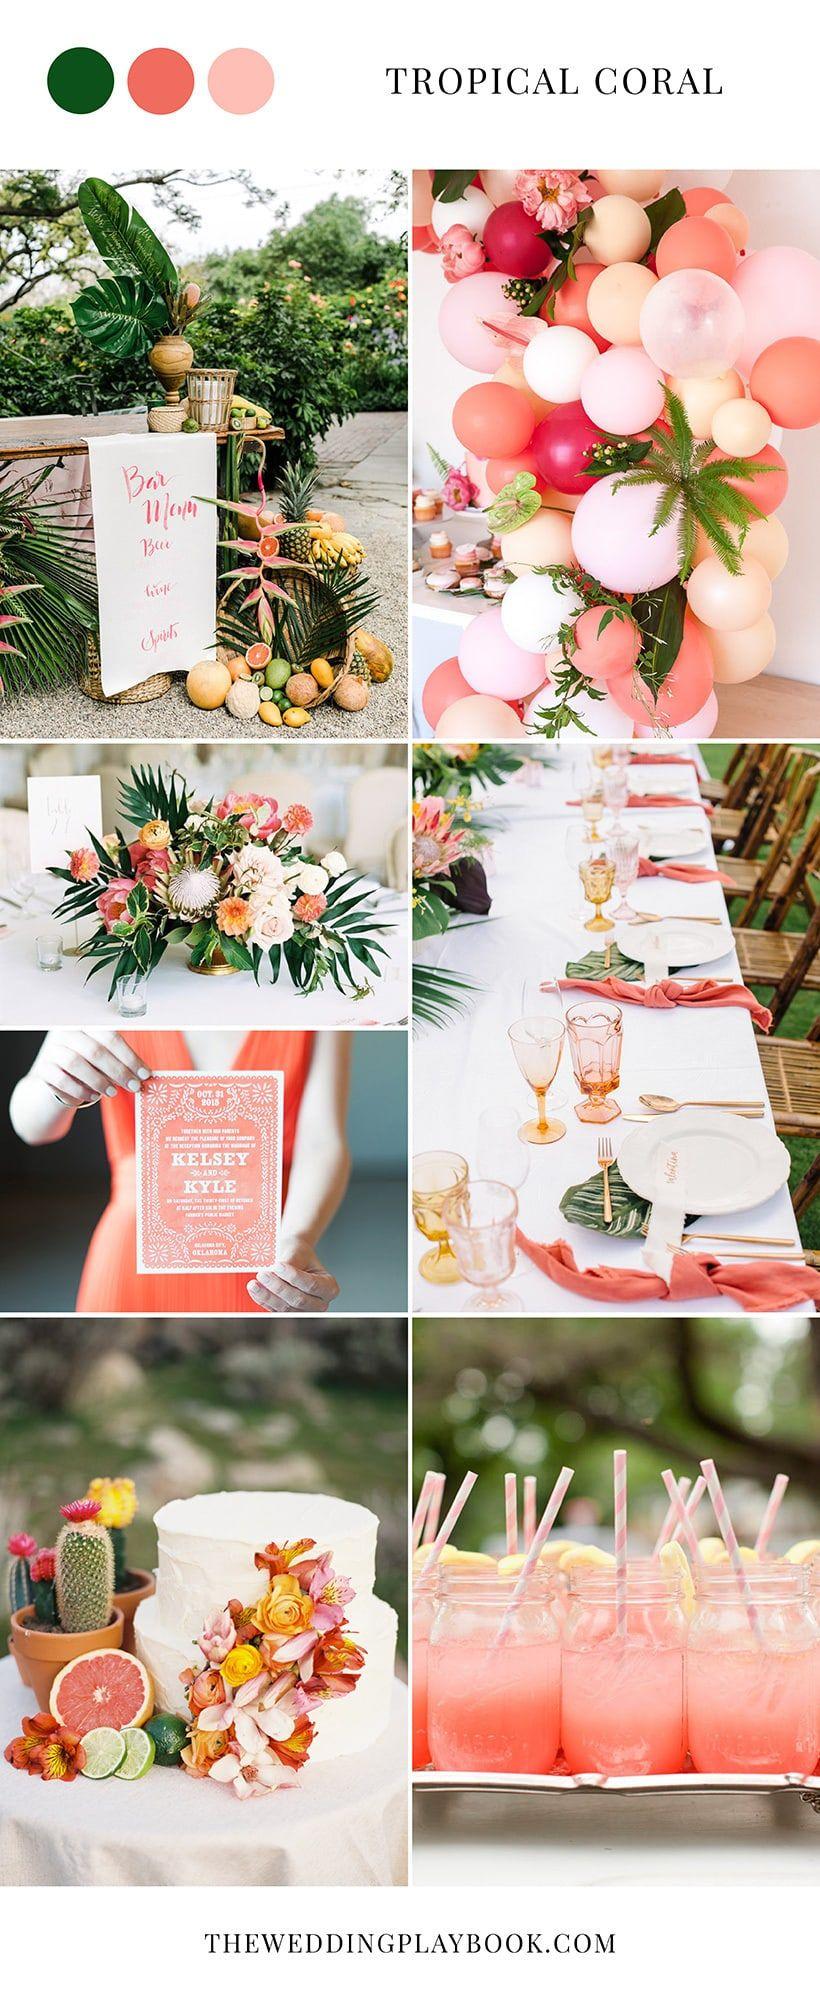 Tropical Coral Wedding Inspiration